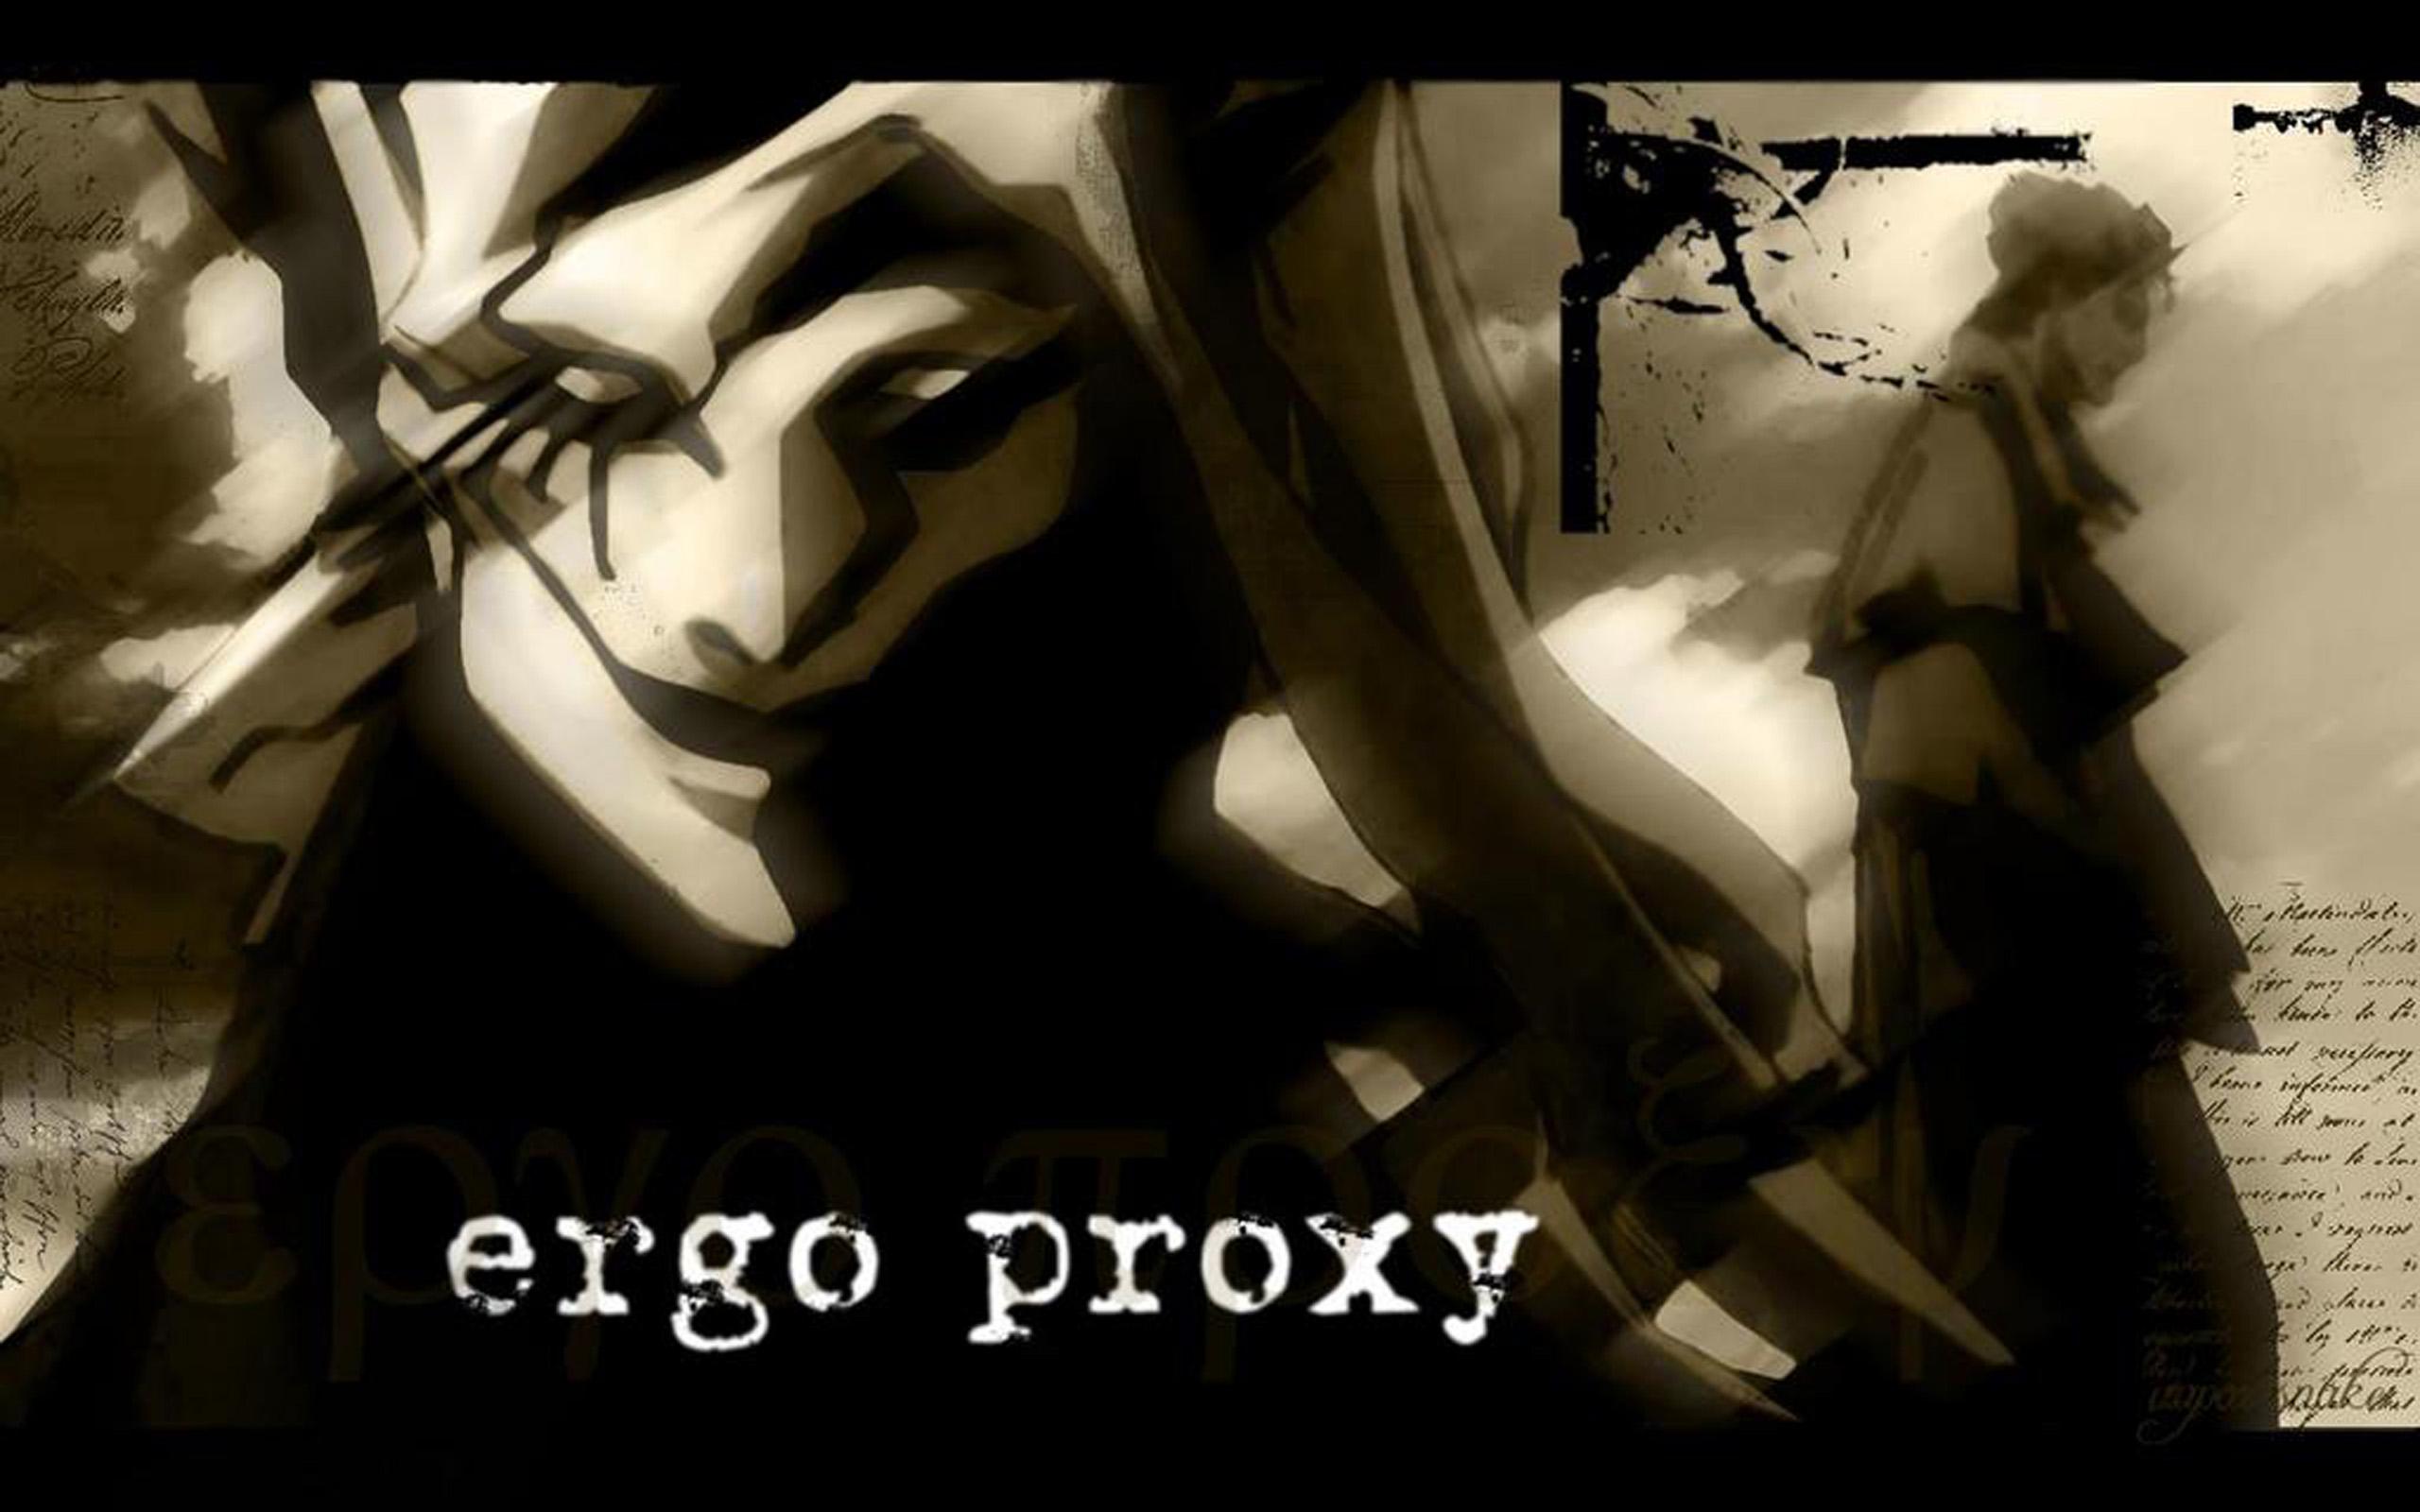 Free download Ergo proxy wallpaper HQ WALLPAPER 176869 [2560x1600